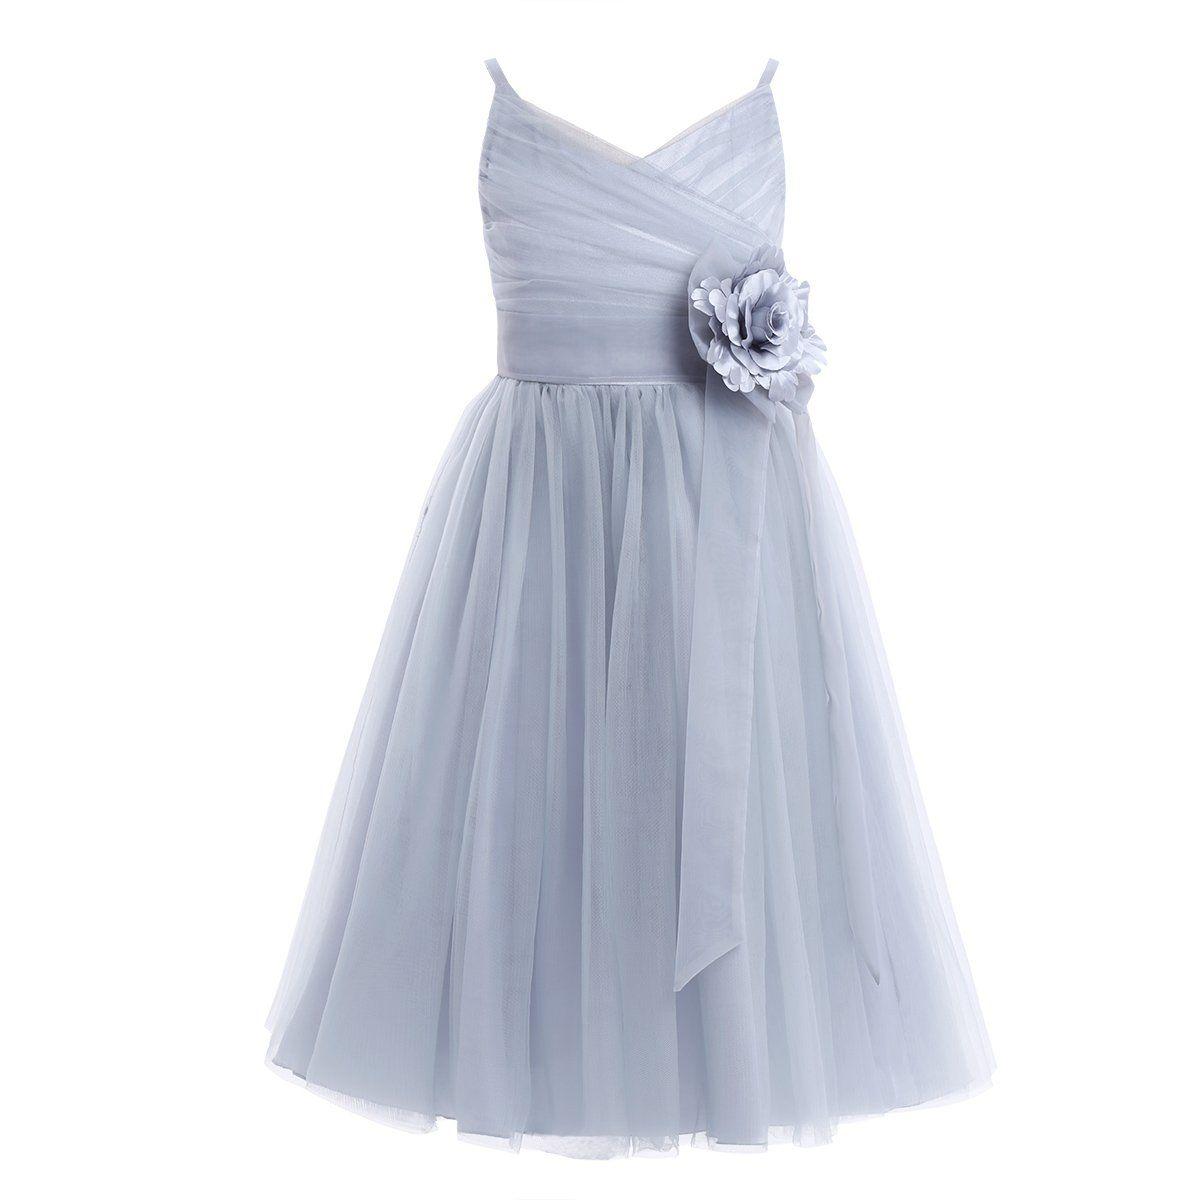 e78e91973387 iiniim Kids Girls Sleeveless Flower Wedding Bridesmaid Party Pageant ...